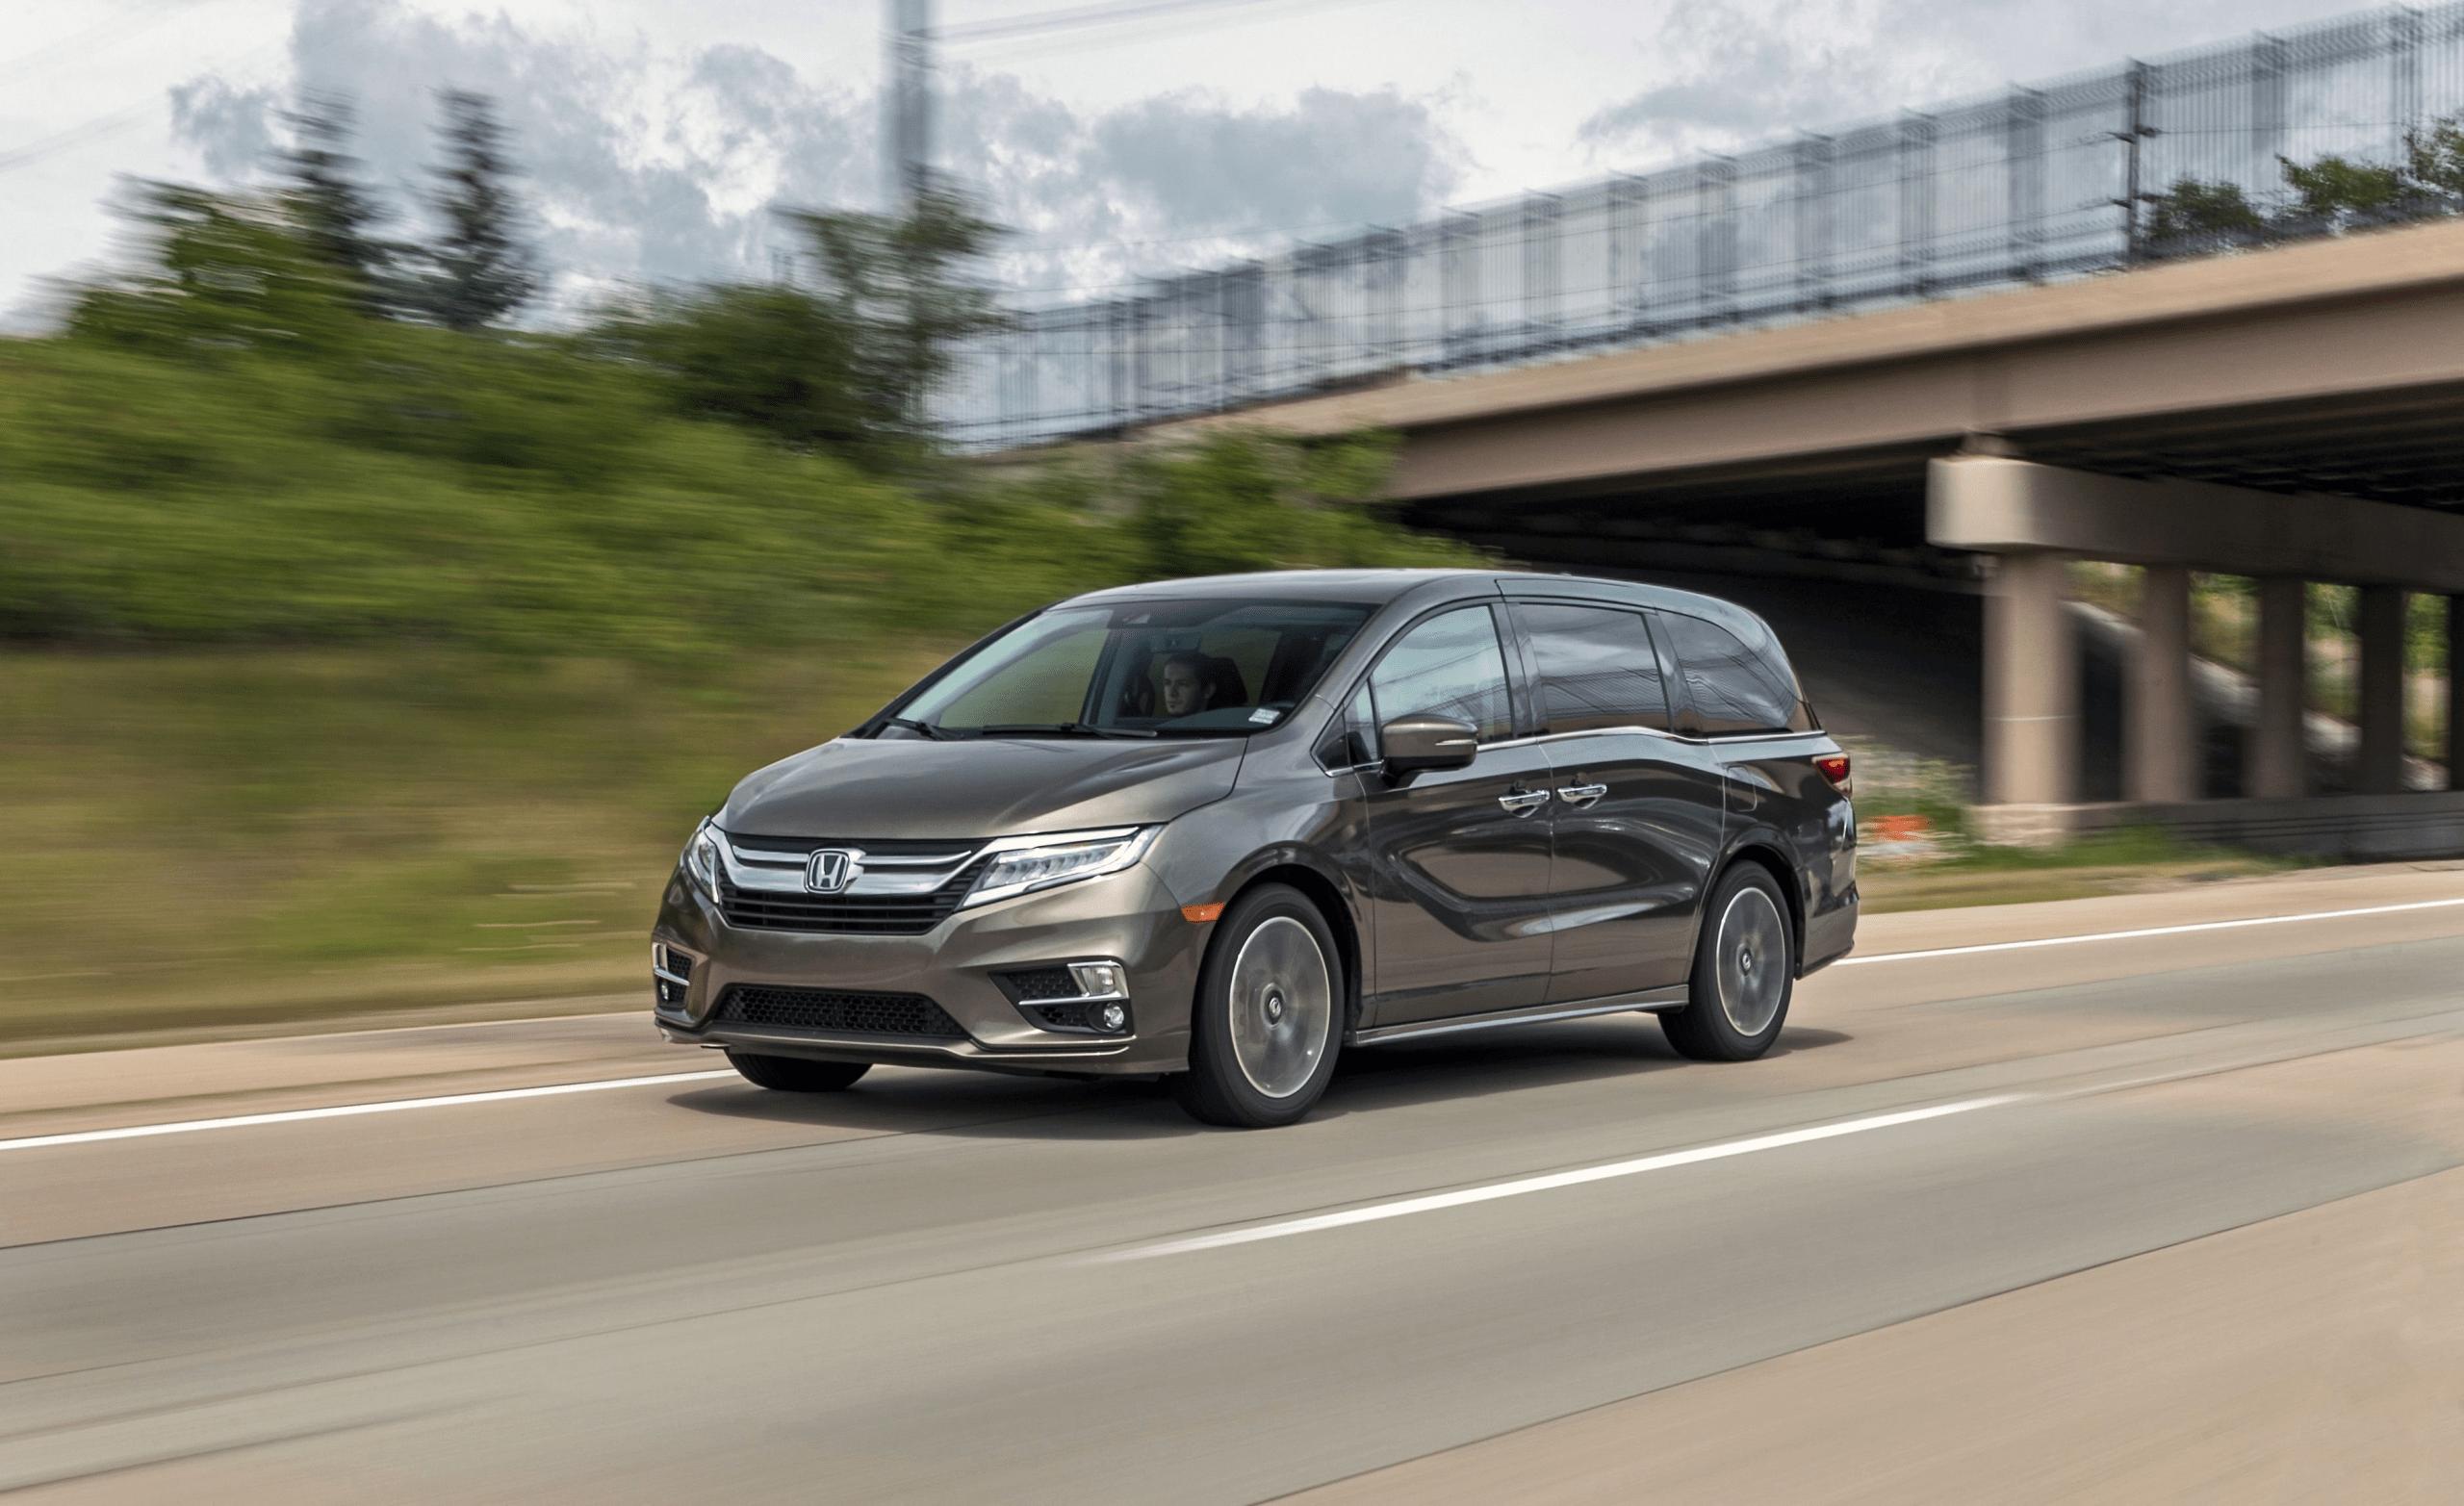 2021 Honda Odyssey Specs in 2020 Honda odyssey, Mini van